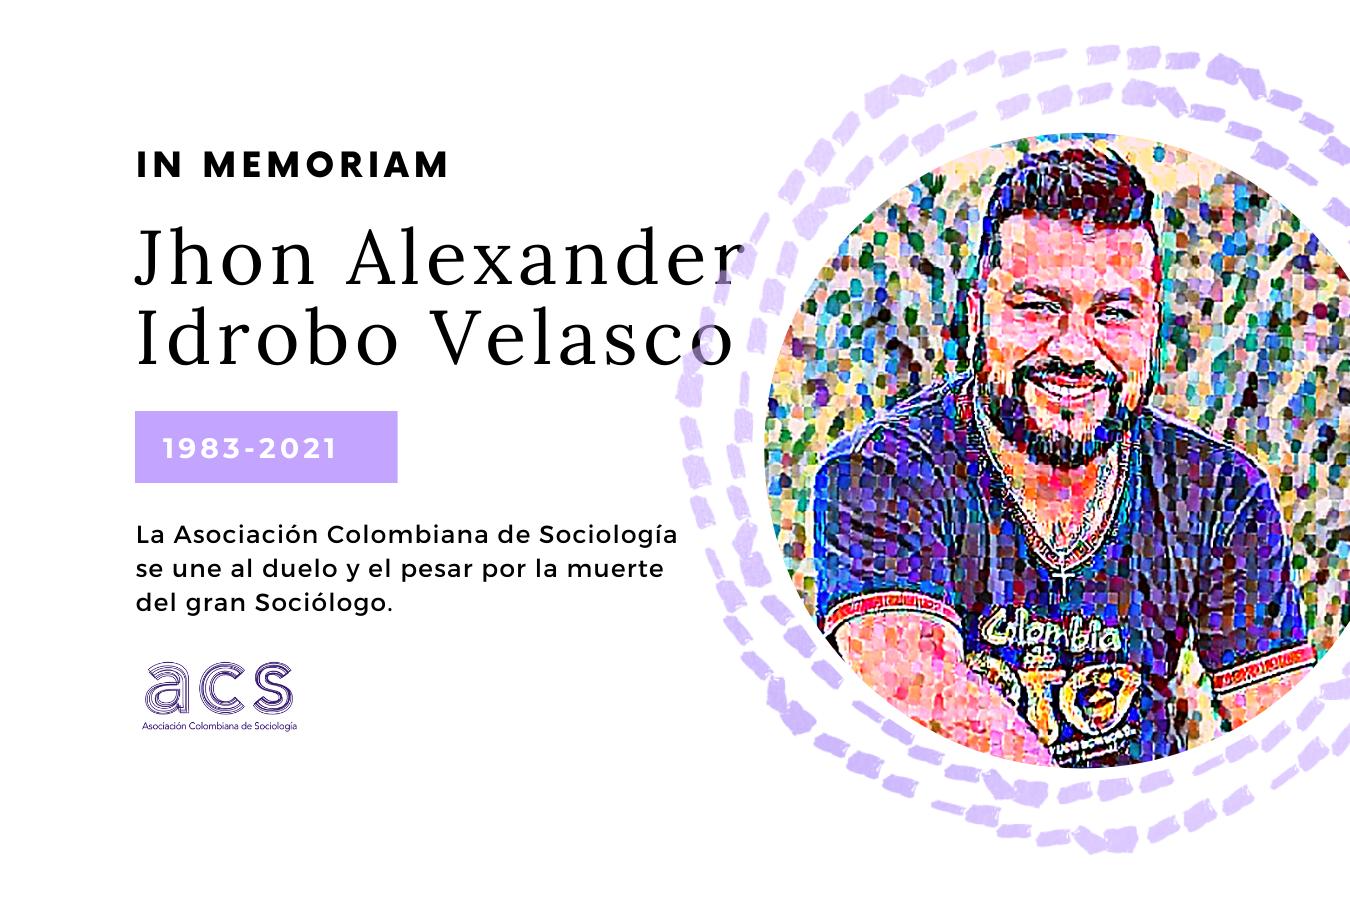 IN MEMORIAM Jhon Alexander Idrobo